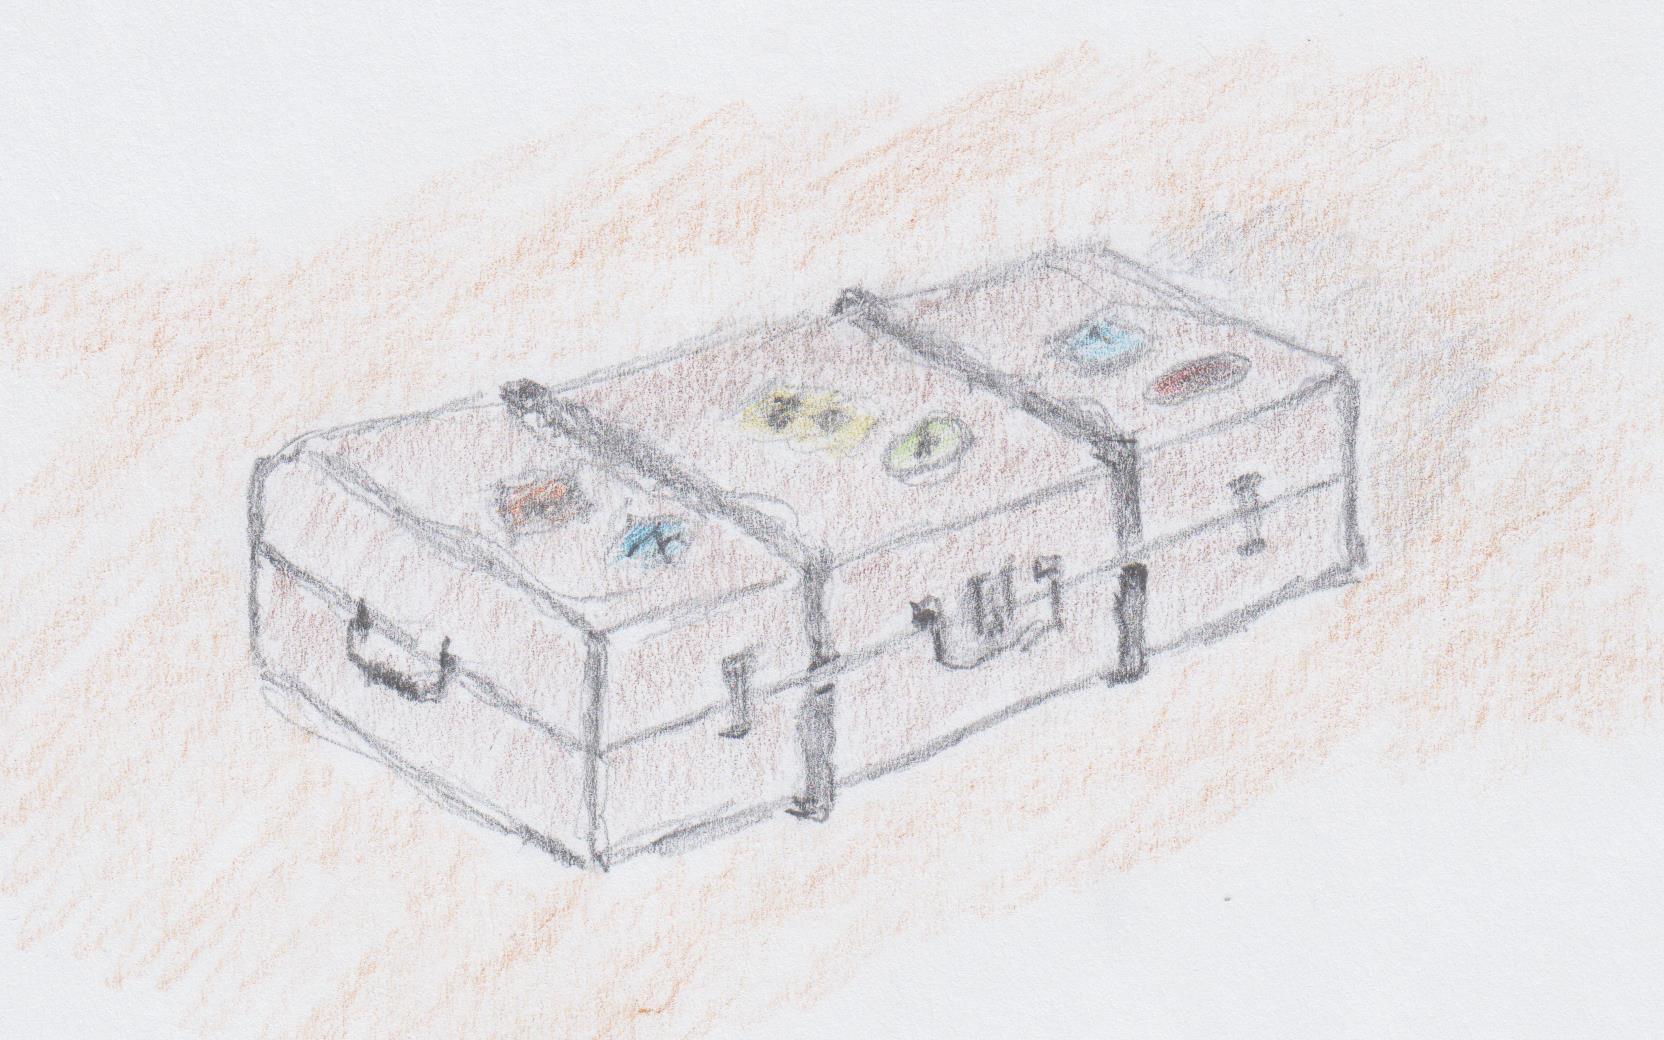 Rejsekufferten